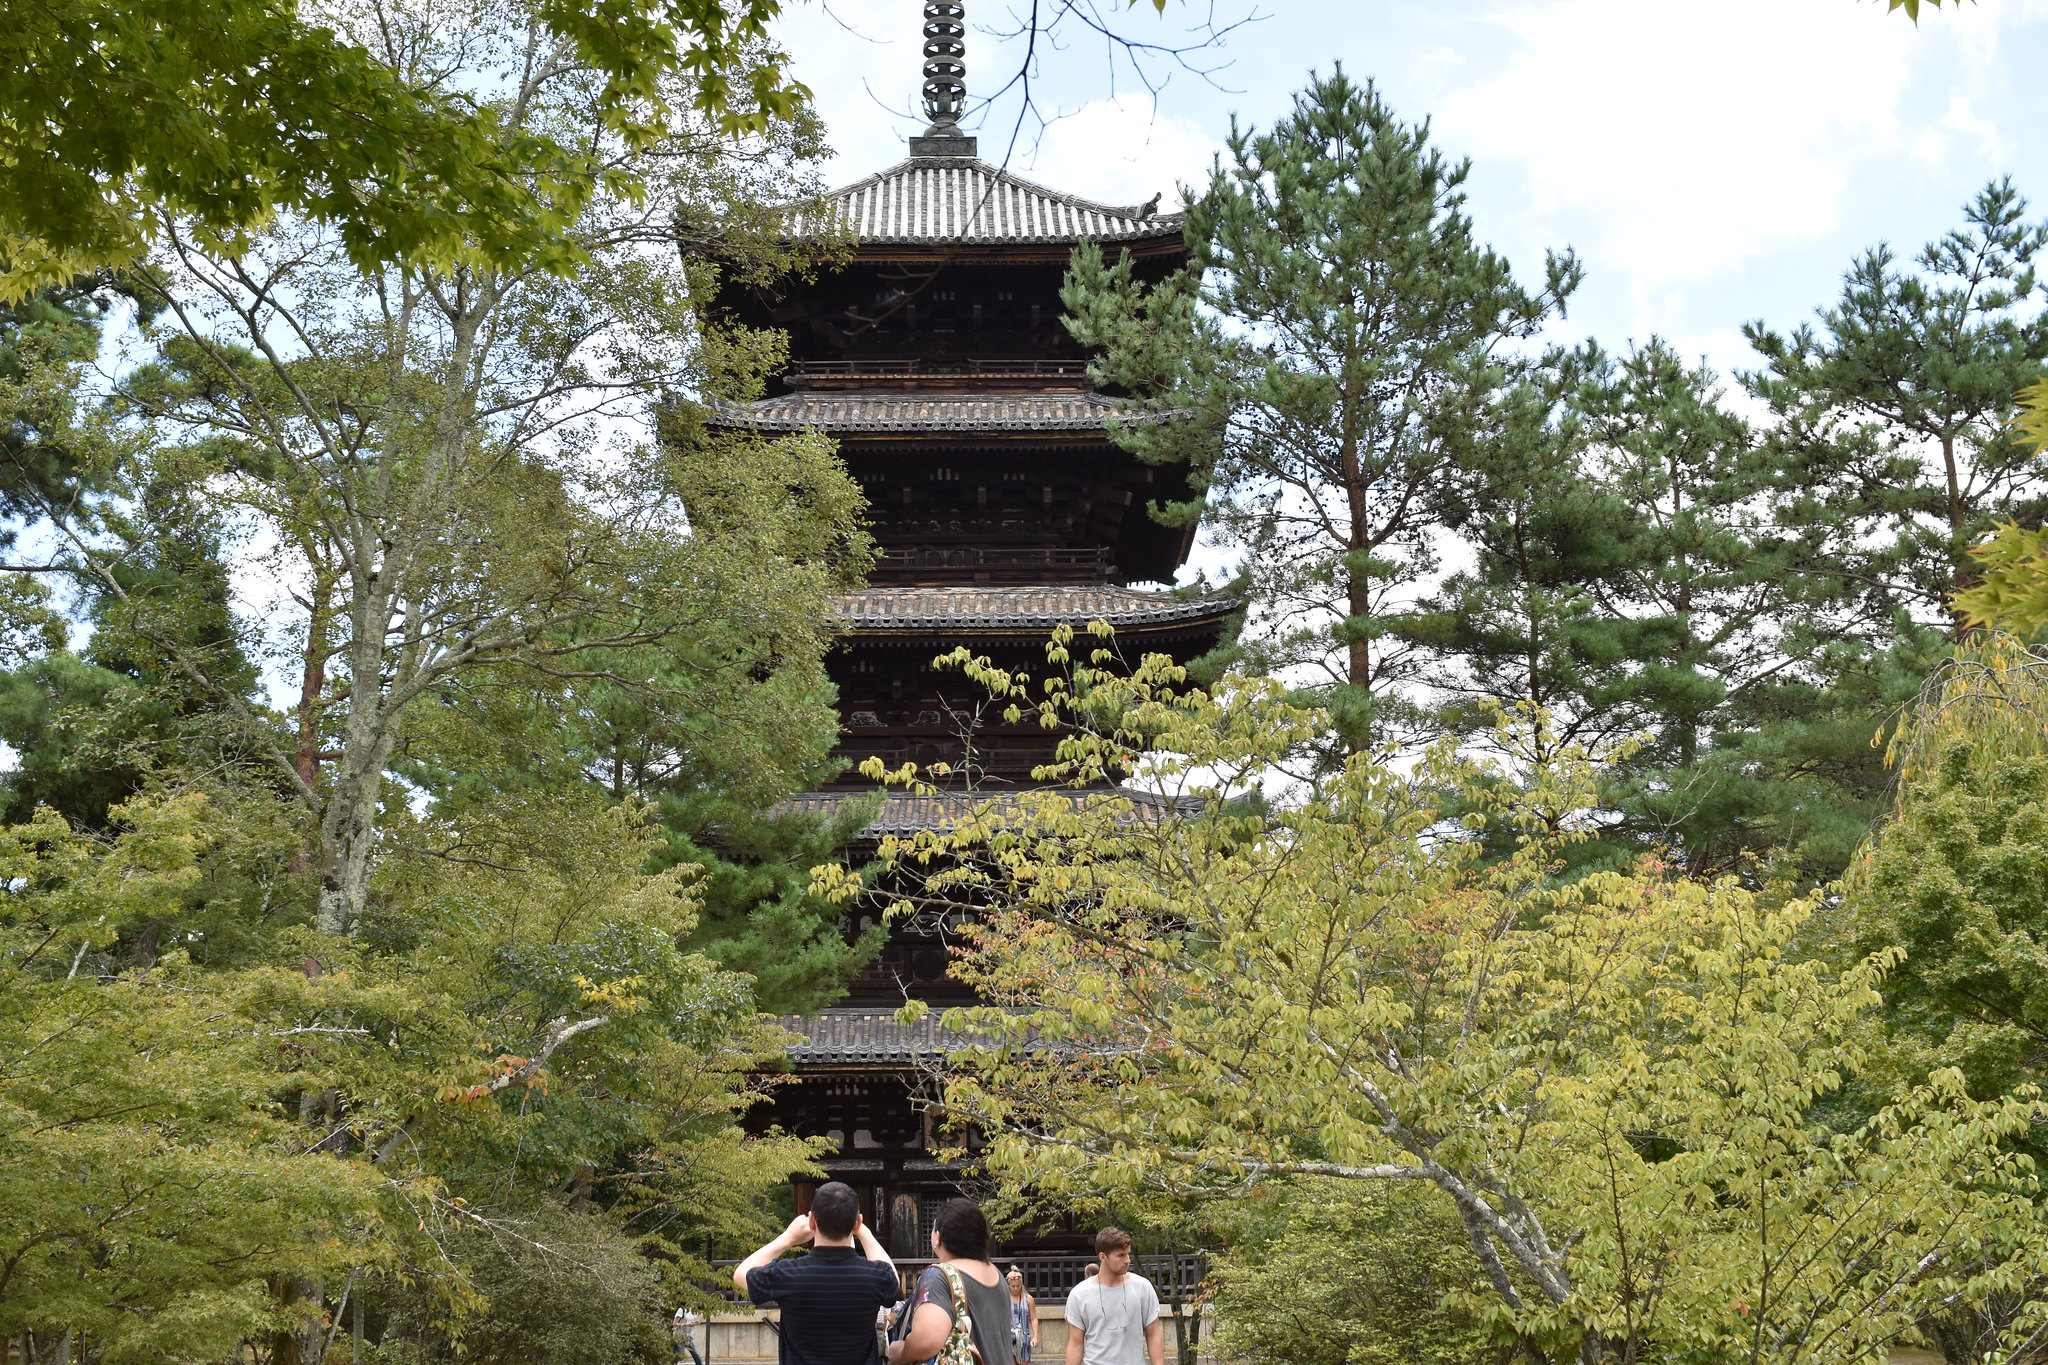 仁和寺(Ninnaji-temple)